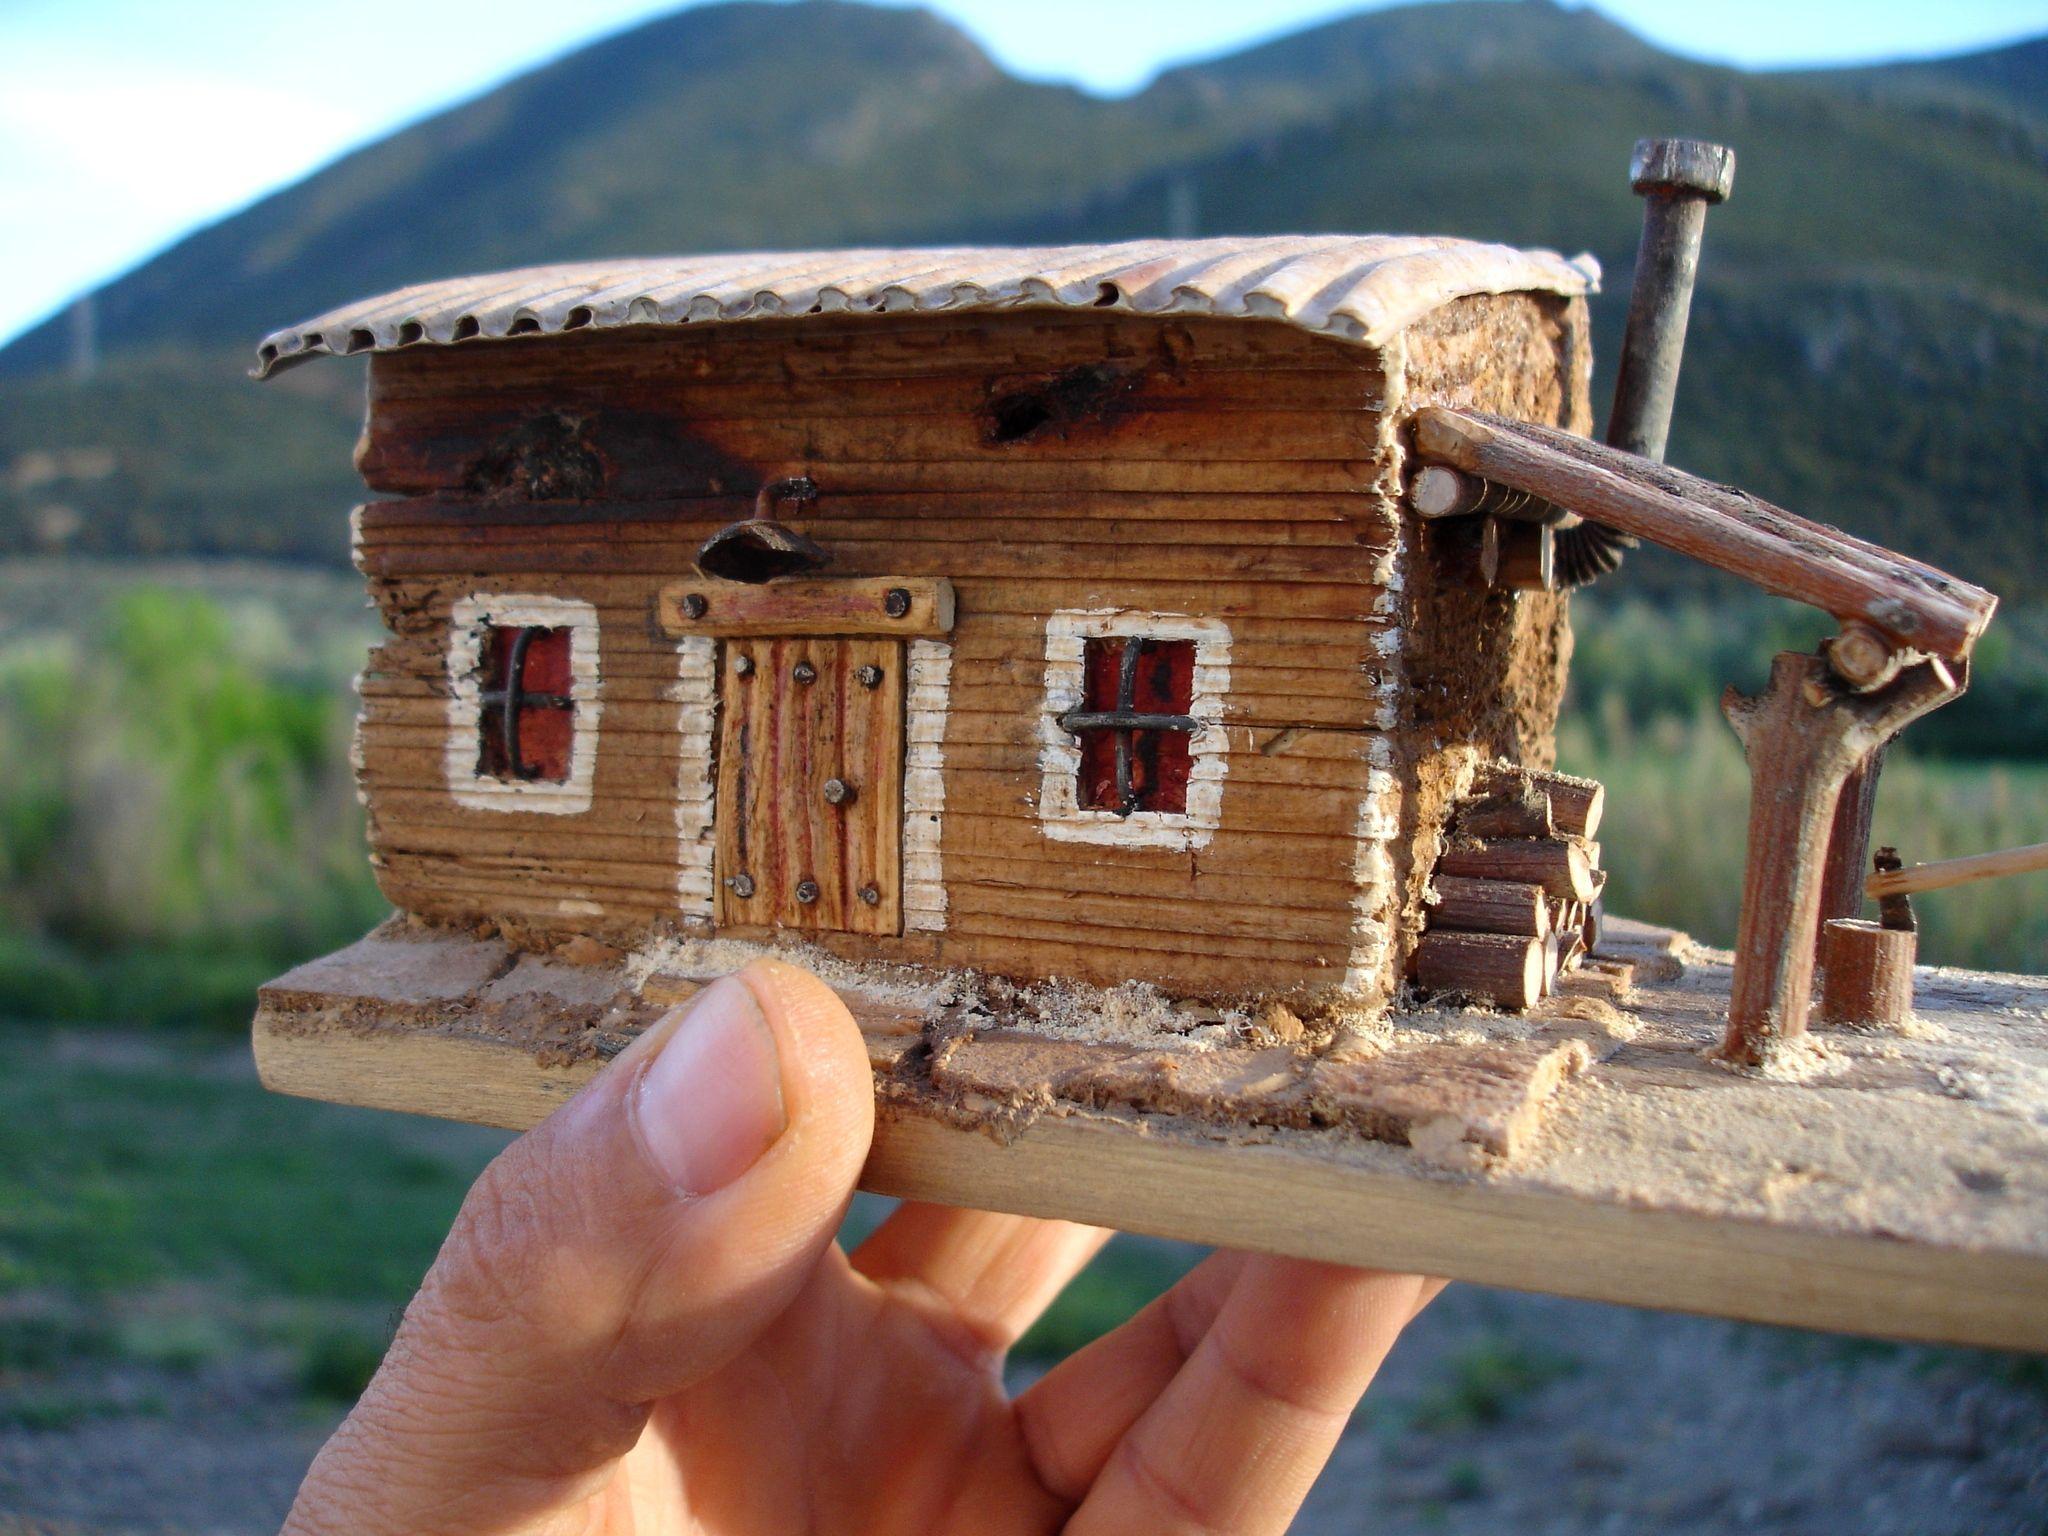 Pin de made madera en houses casas con tacos de palets madera madera reciclada y casas de - Casas en miniatura de madera ...